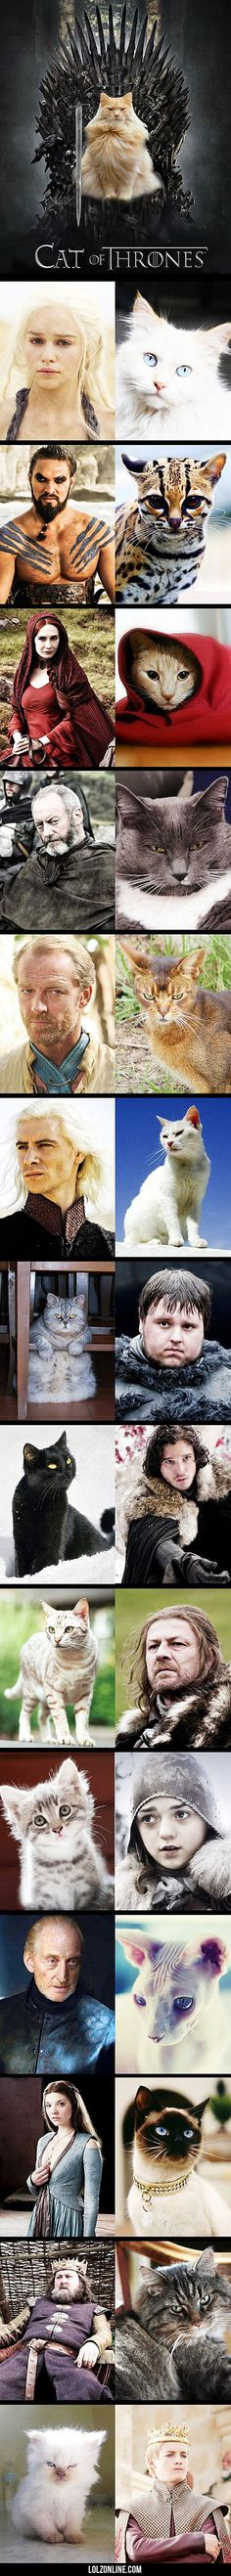 Cat Of Thrones #lol #haha #funny